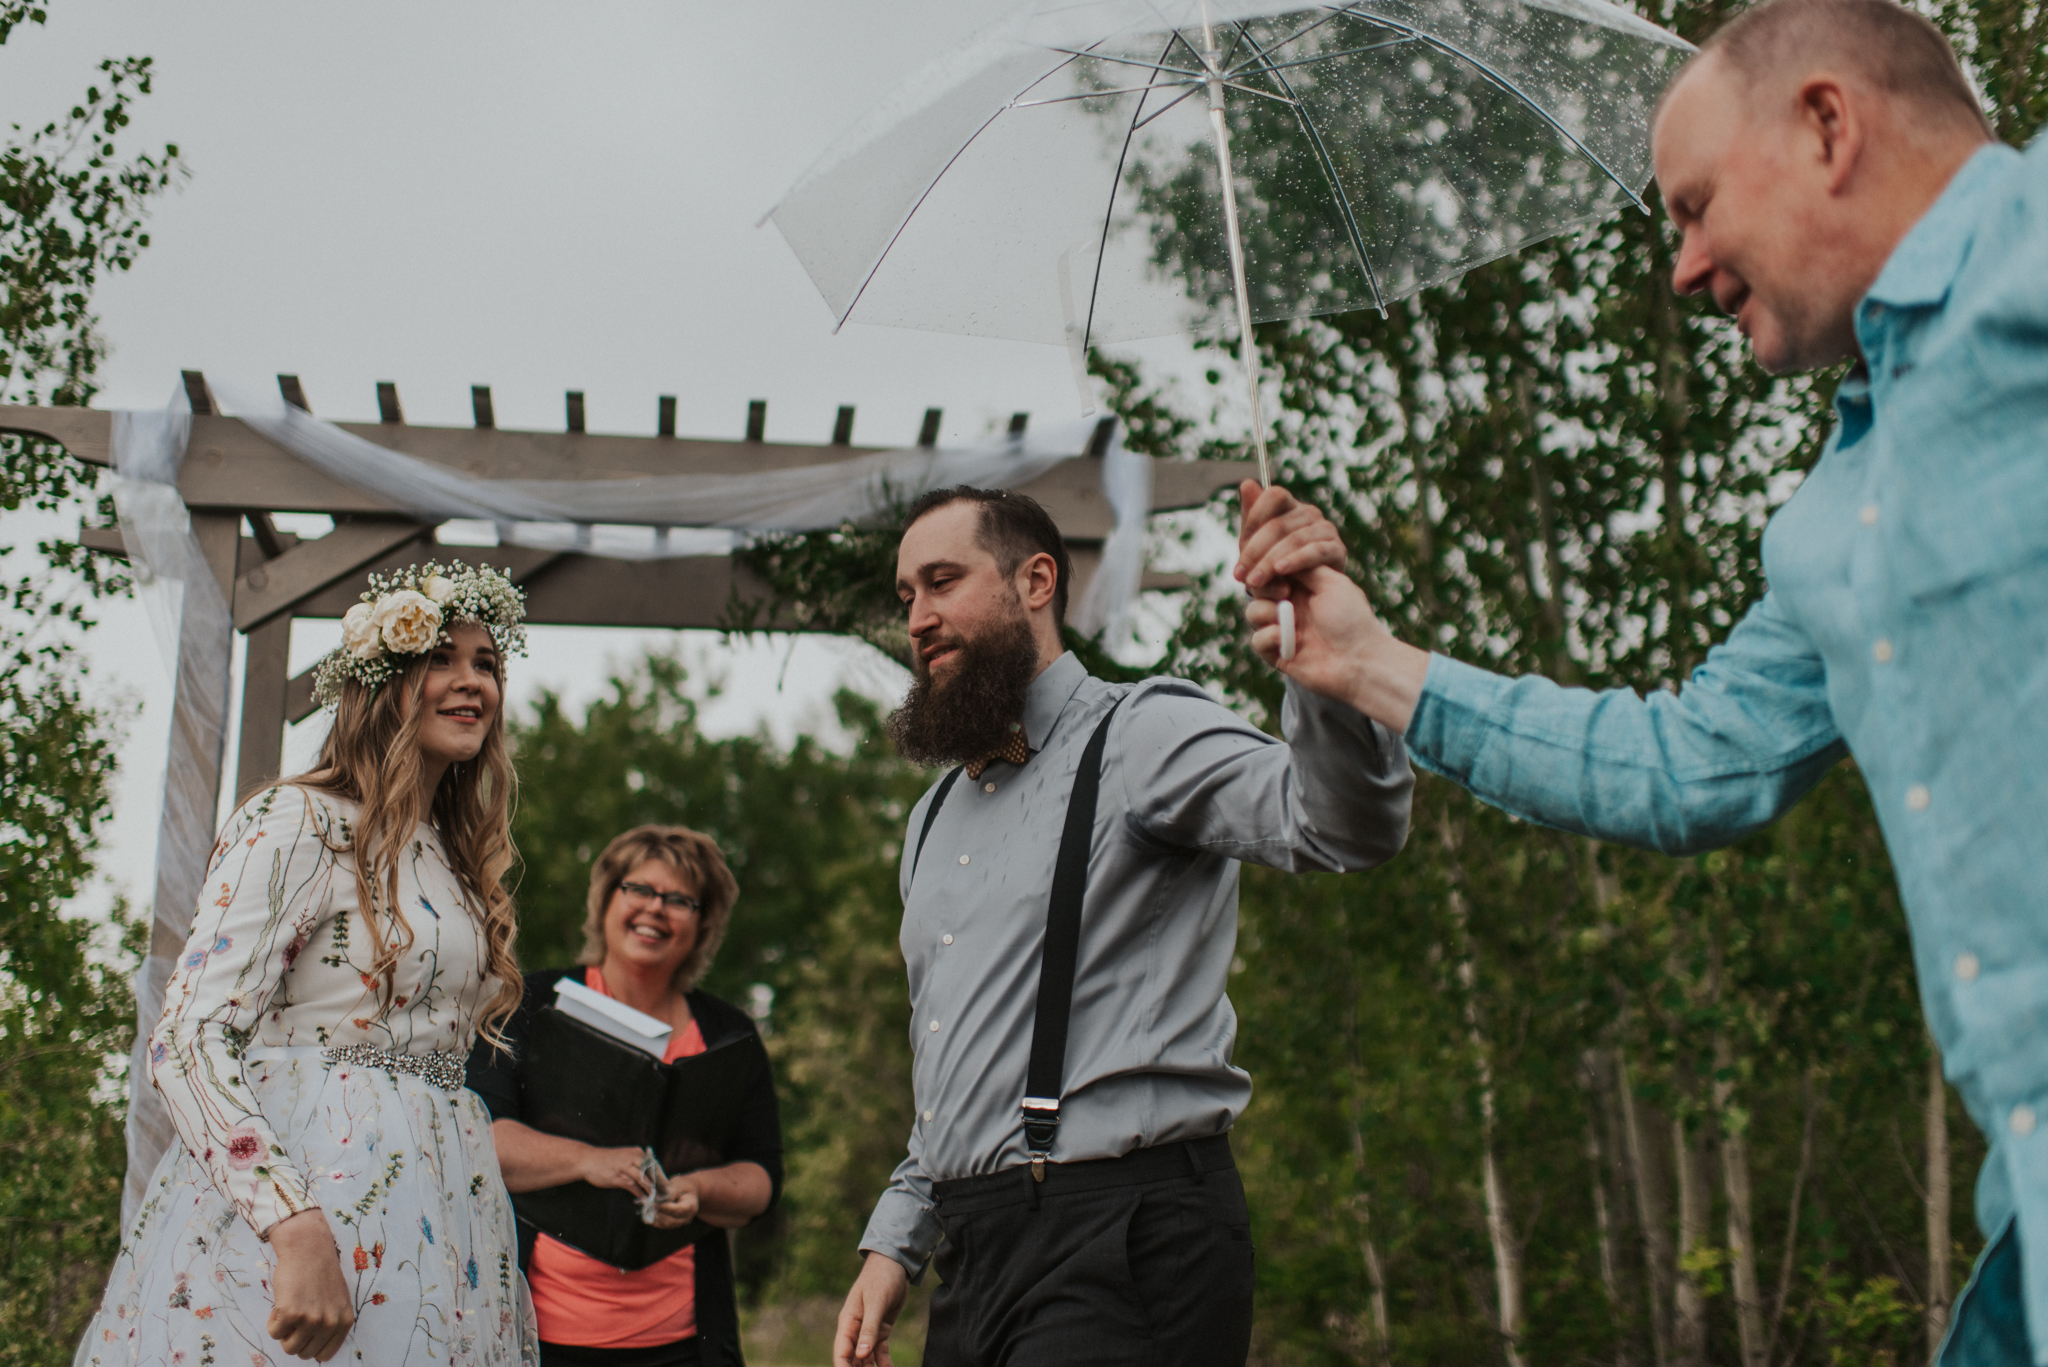 Rainy June wedding